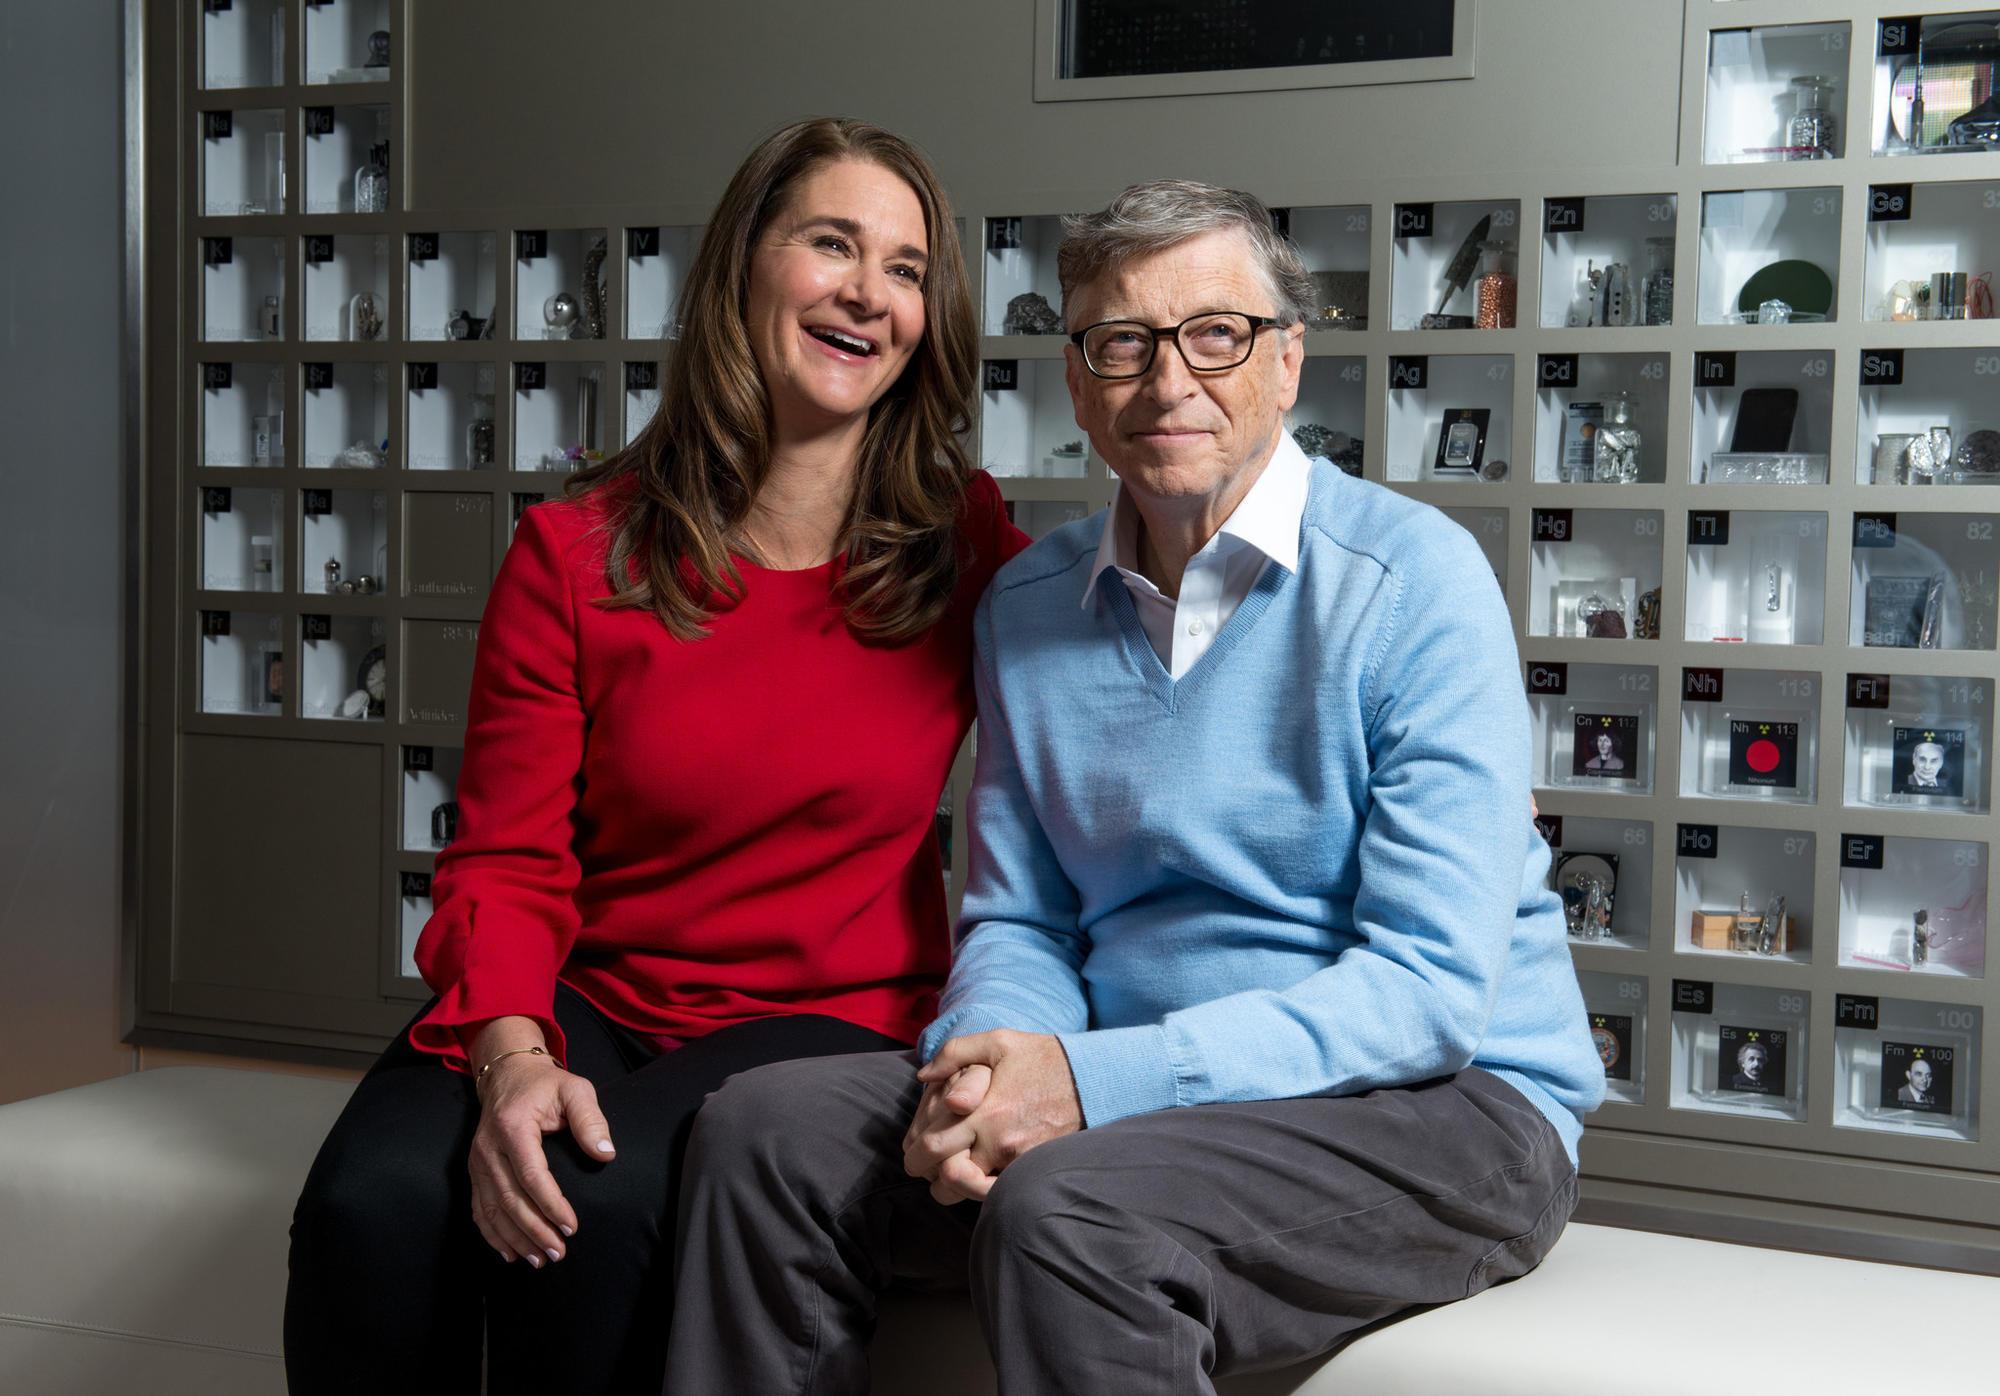 Bill Melinda Gates Turn Attention Toward Poverty In America